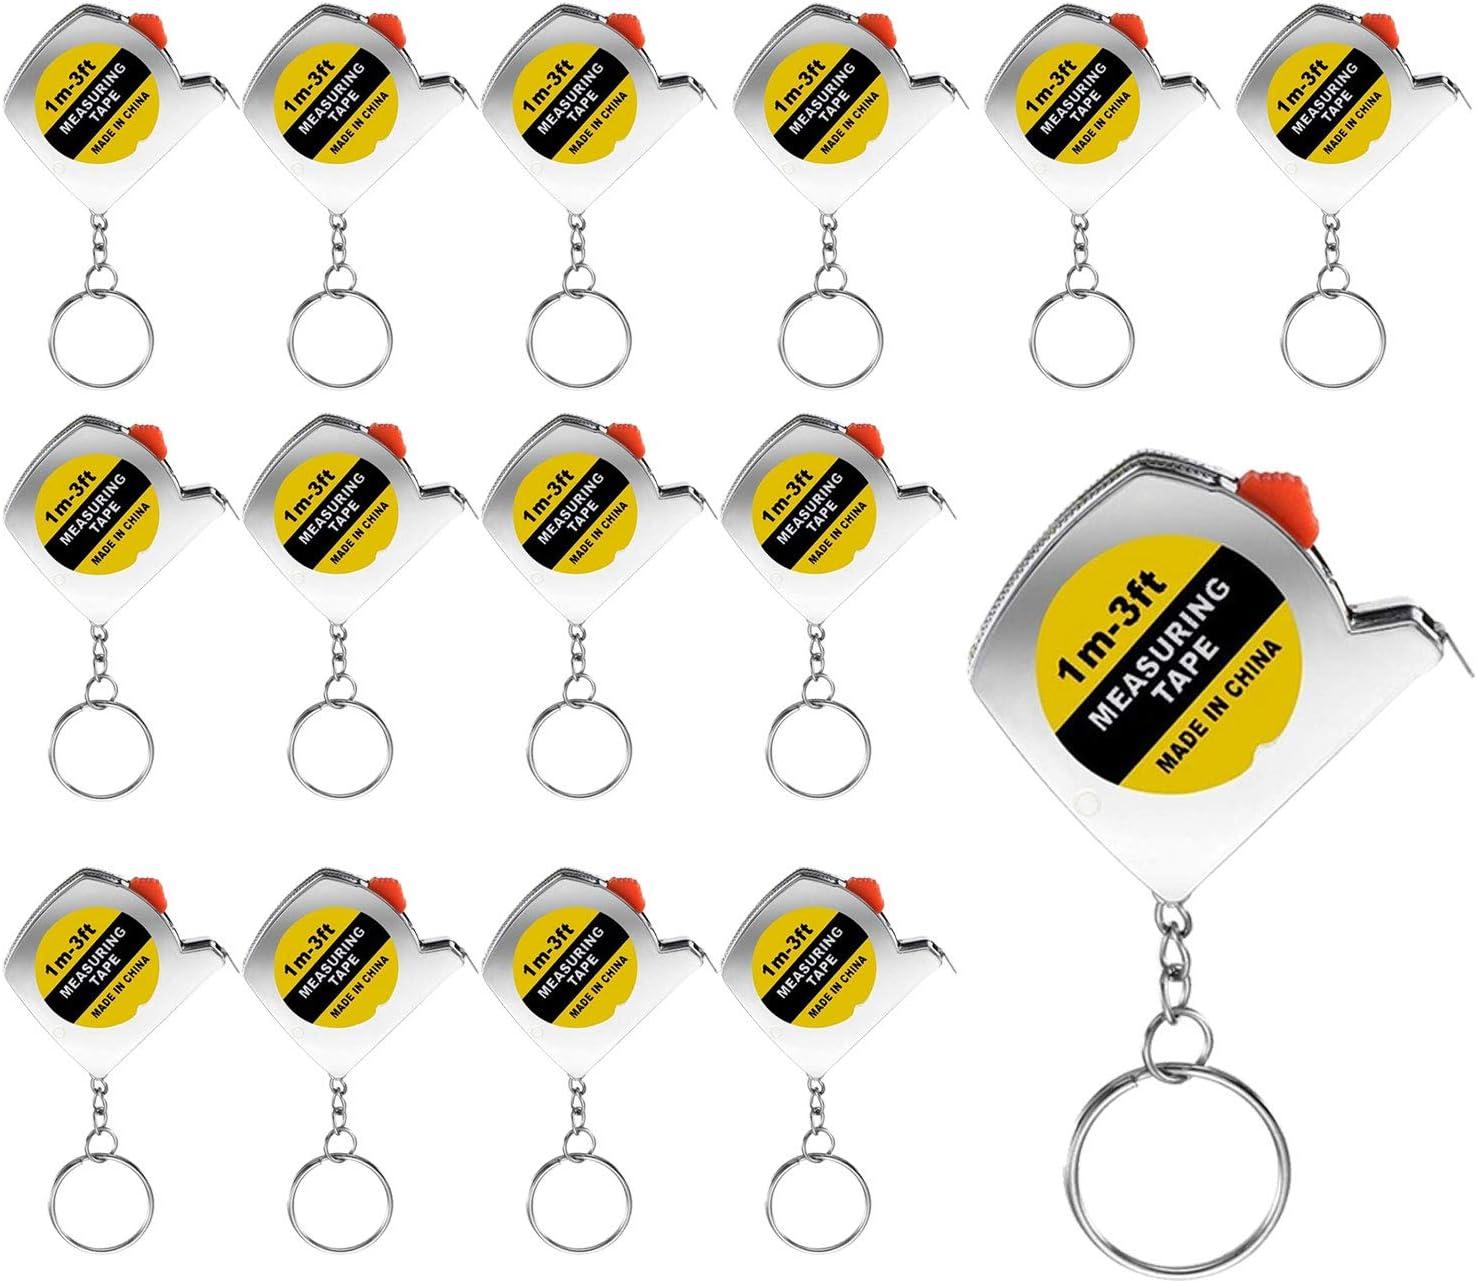 Trounistro 30 Max 68% OFF Pieces Mini Keychains Measure Max 51% OFF Ke Tape